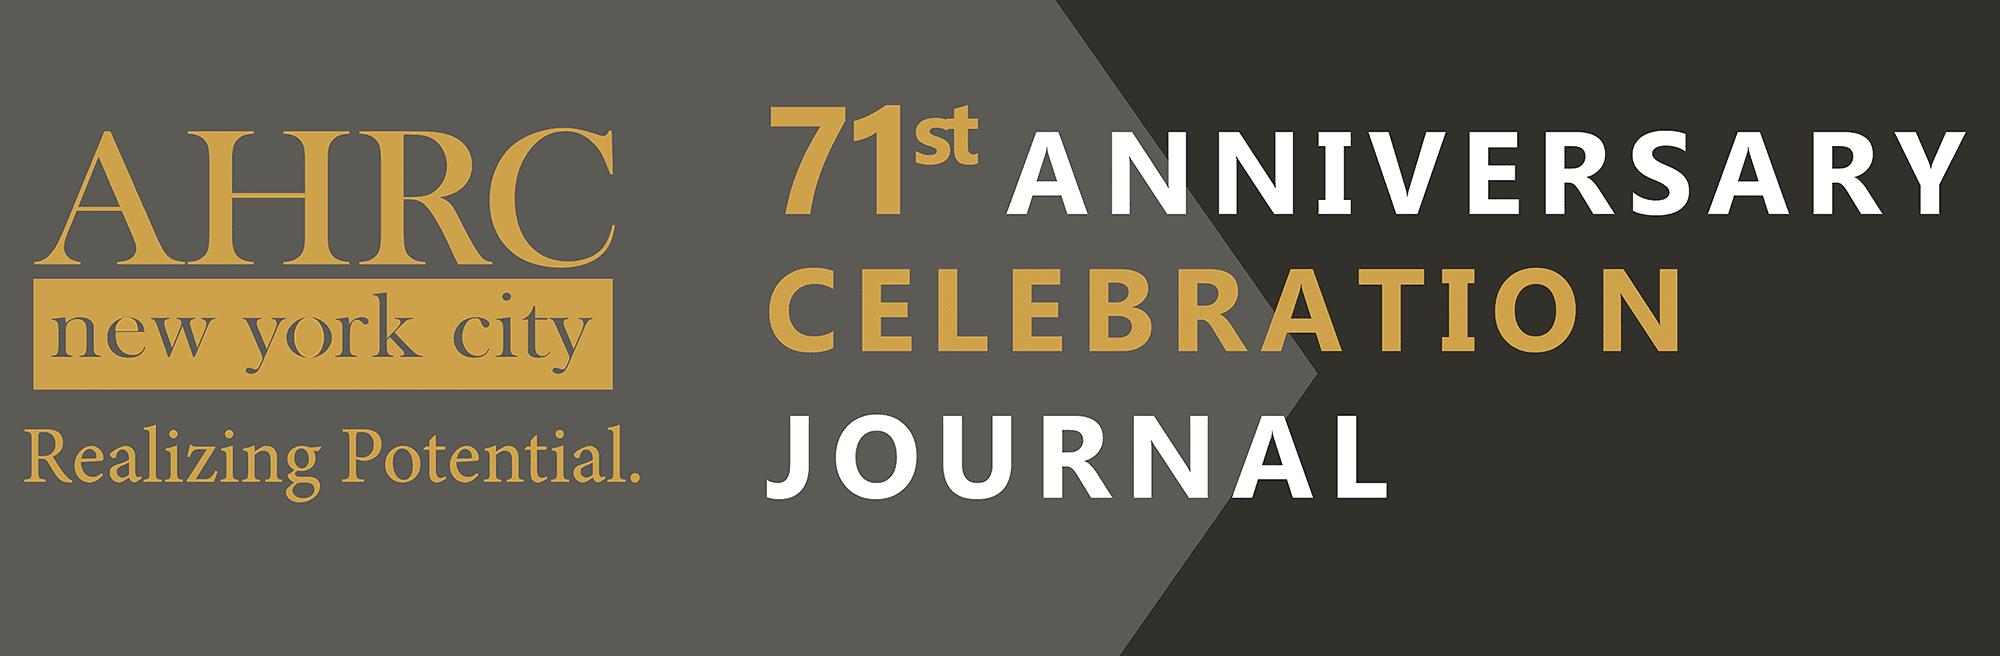 71st Anniversary Celebration Journal